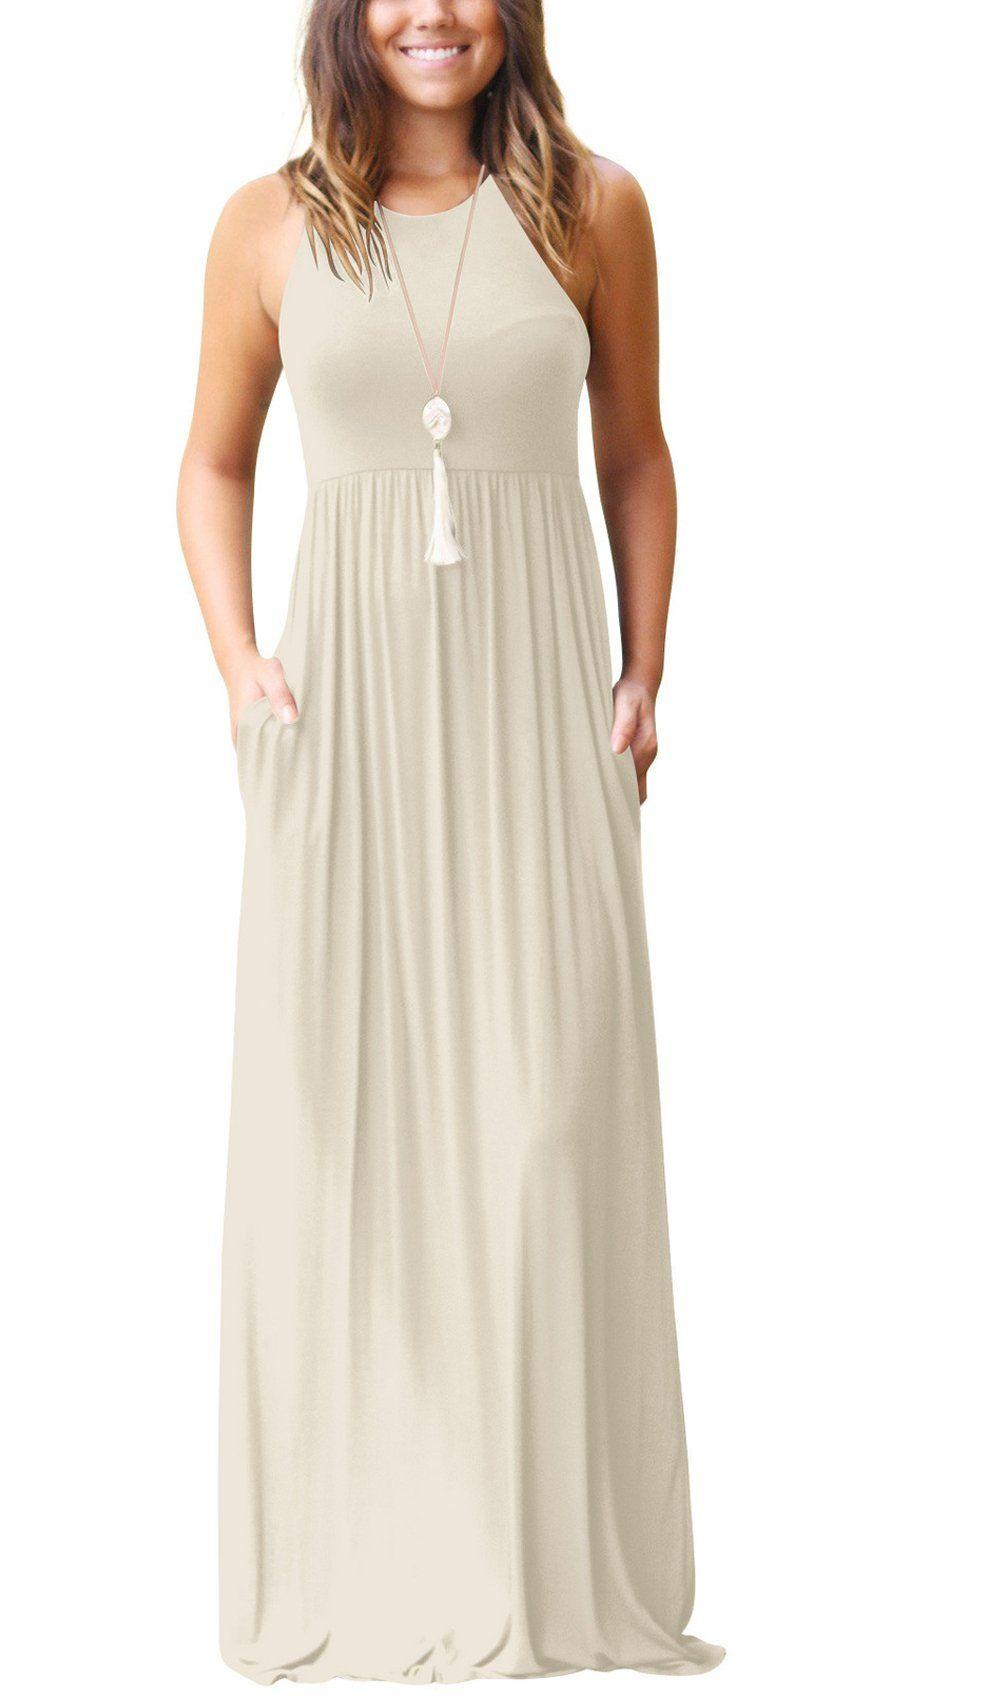 Hotmiss Womens Sleeveless Racerback Loose Plain Maxi Dresses Casual Long Dresses With Pockets Apriot Med Maxi Dresses Casual Plain Maxi Dress Maxi Dresses Fall [ 1698 x 990 Pixel ]